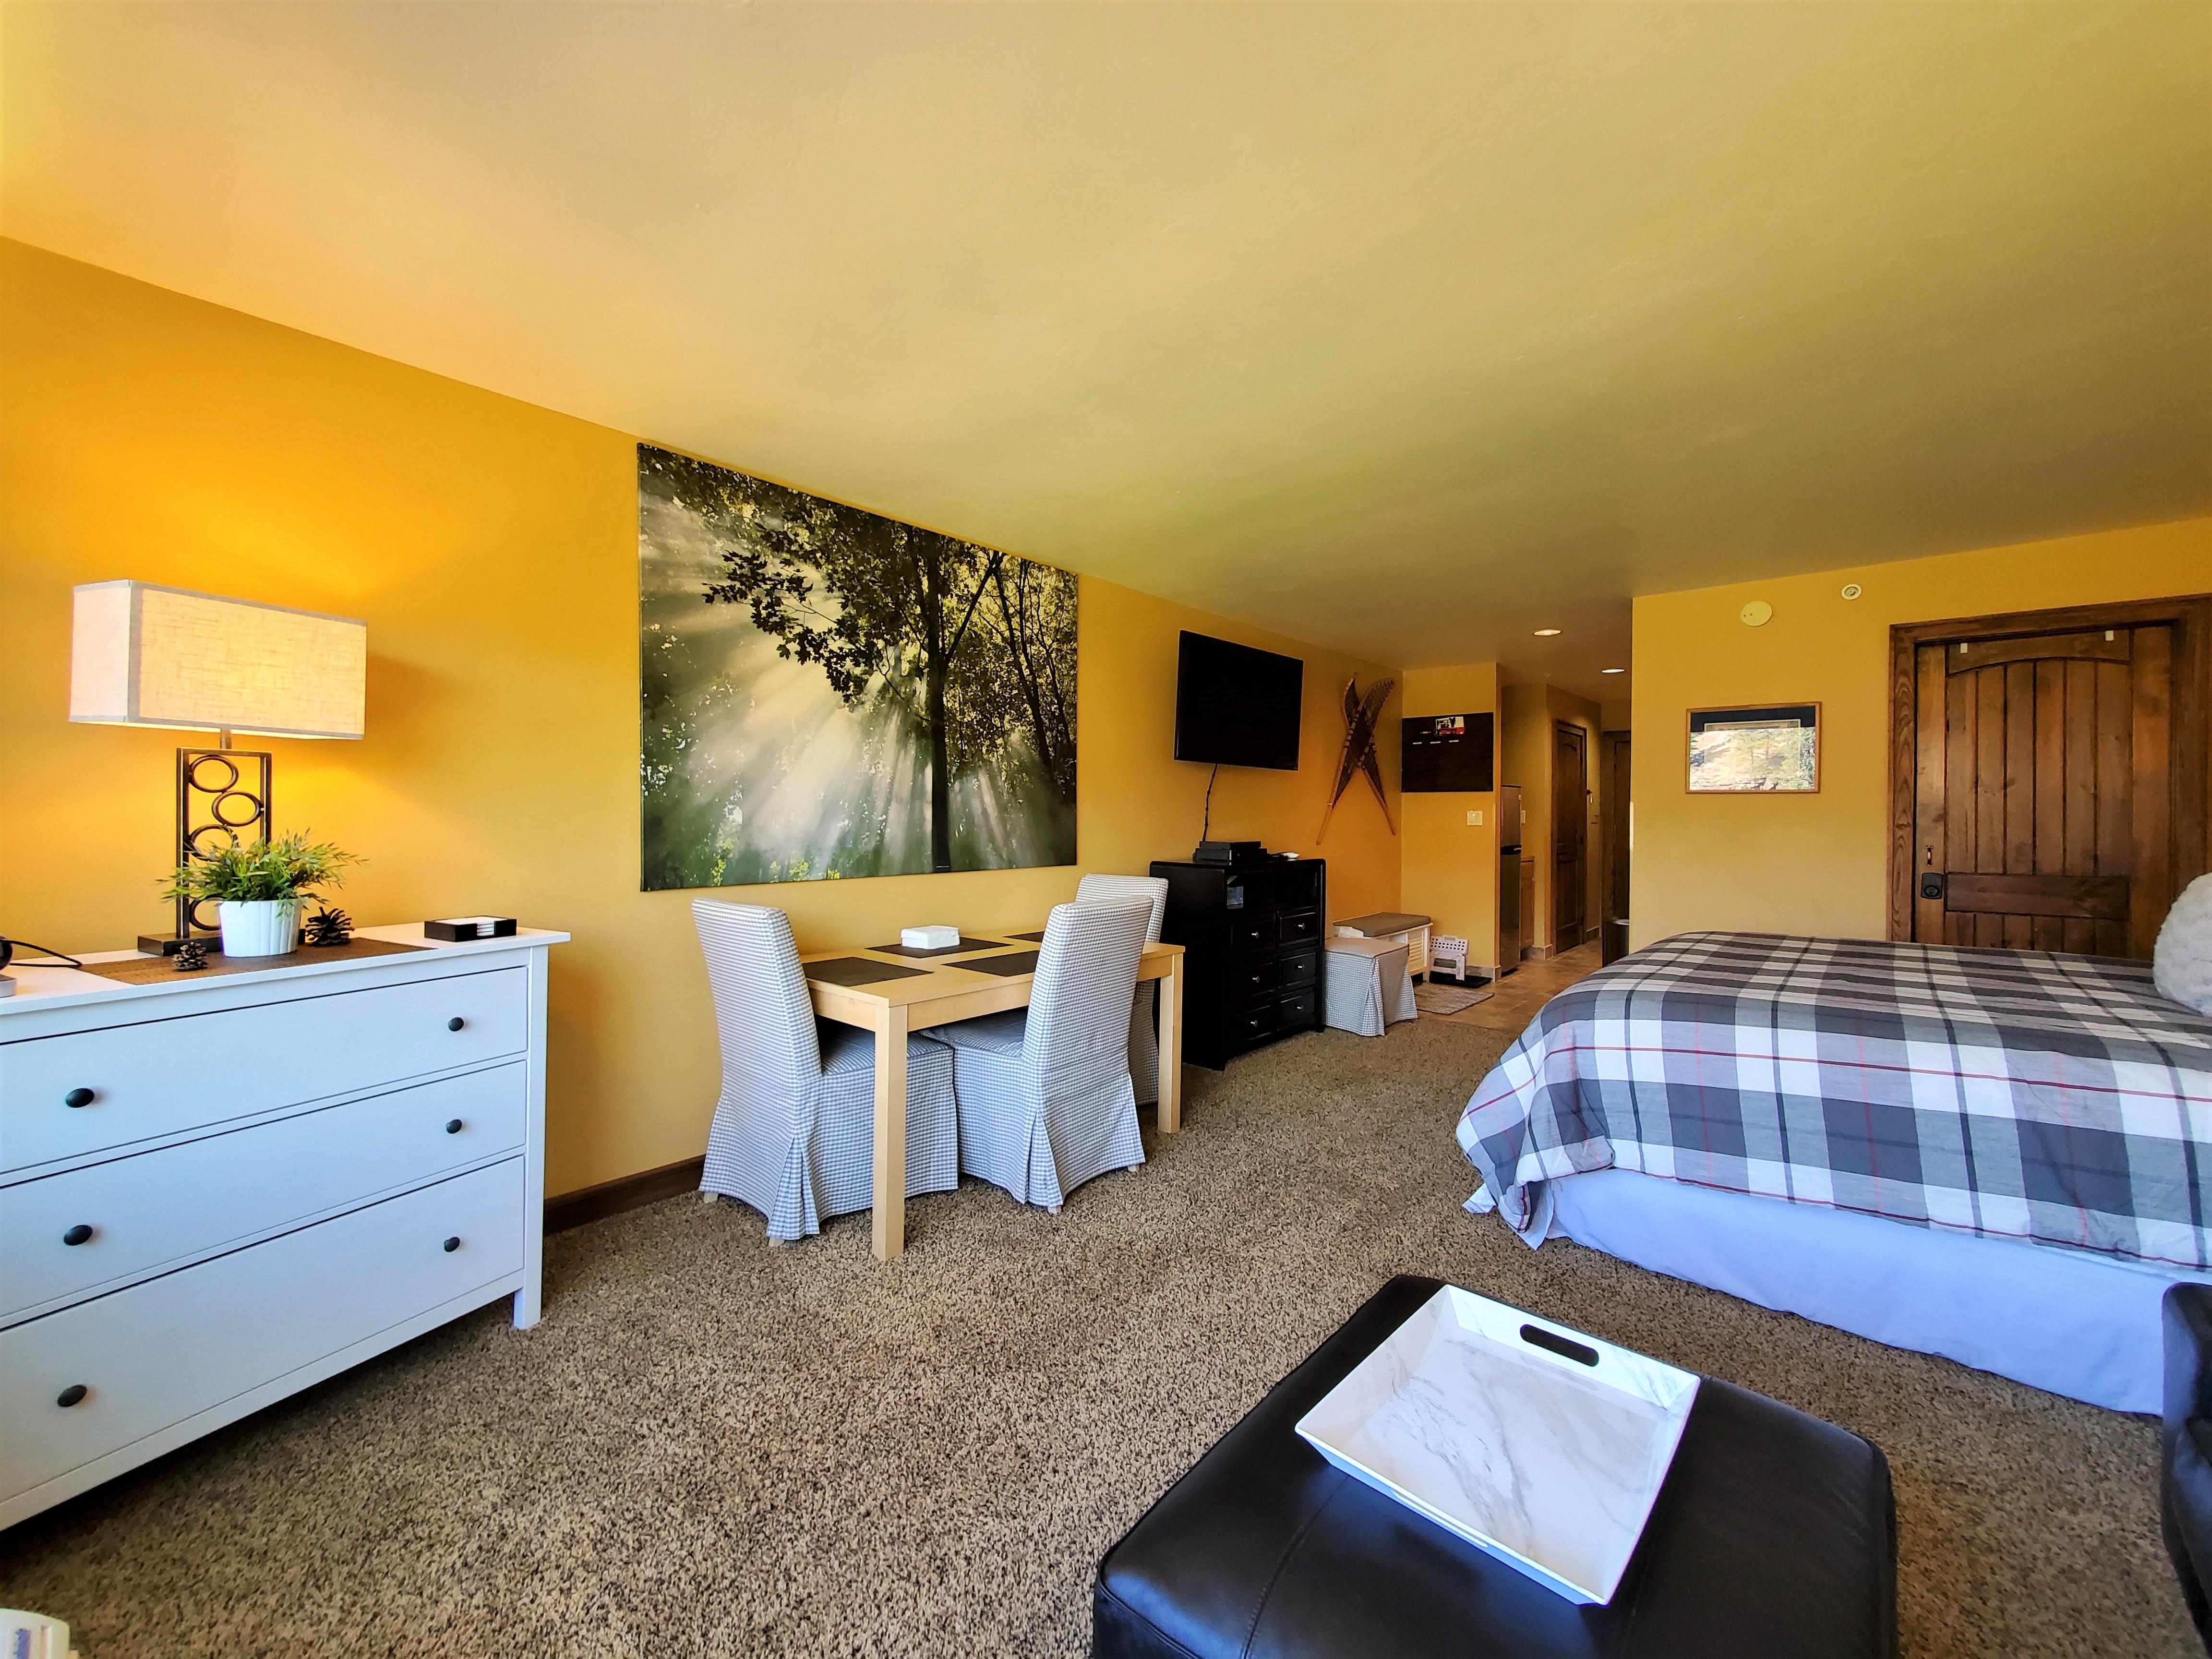 Tamarron Lodge #419 - Mtn Views - Golf - AC/Pool/Hot Tub - Ski Shuttle